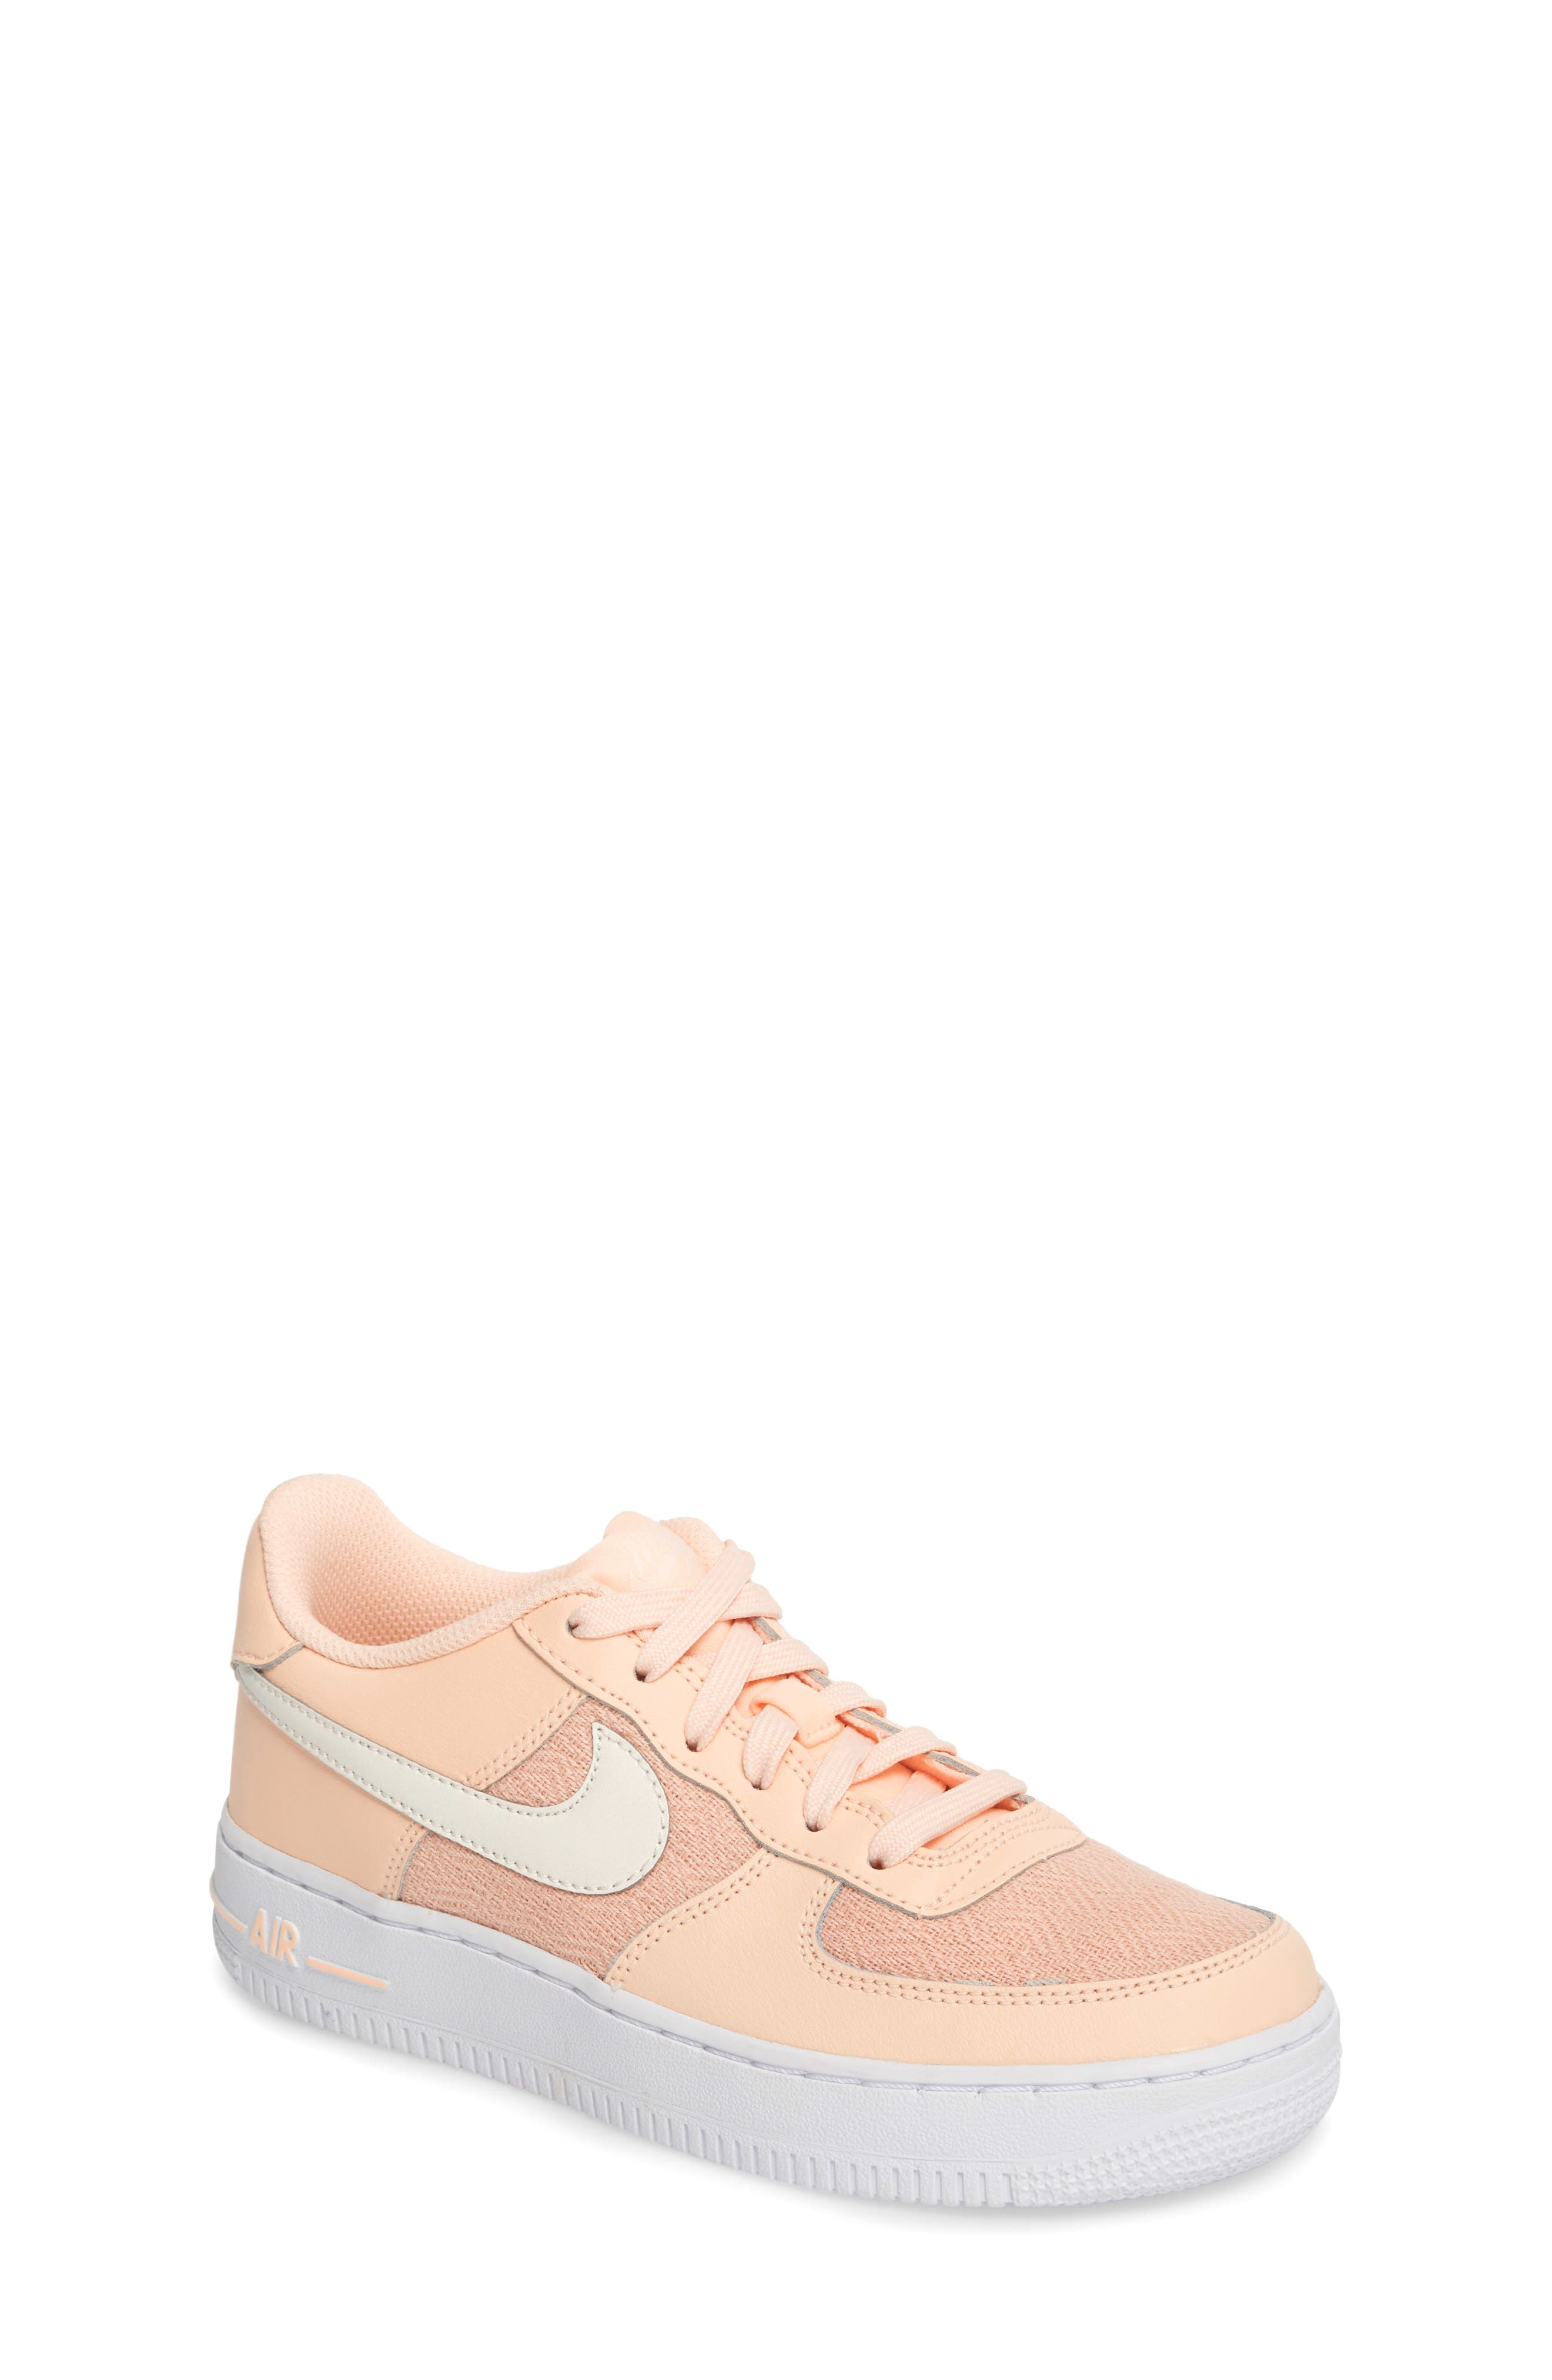 Air Force 1 LV8 Sneaker,                         Main,                         color, Crimson Tint/ Sail/ White